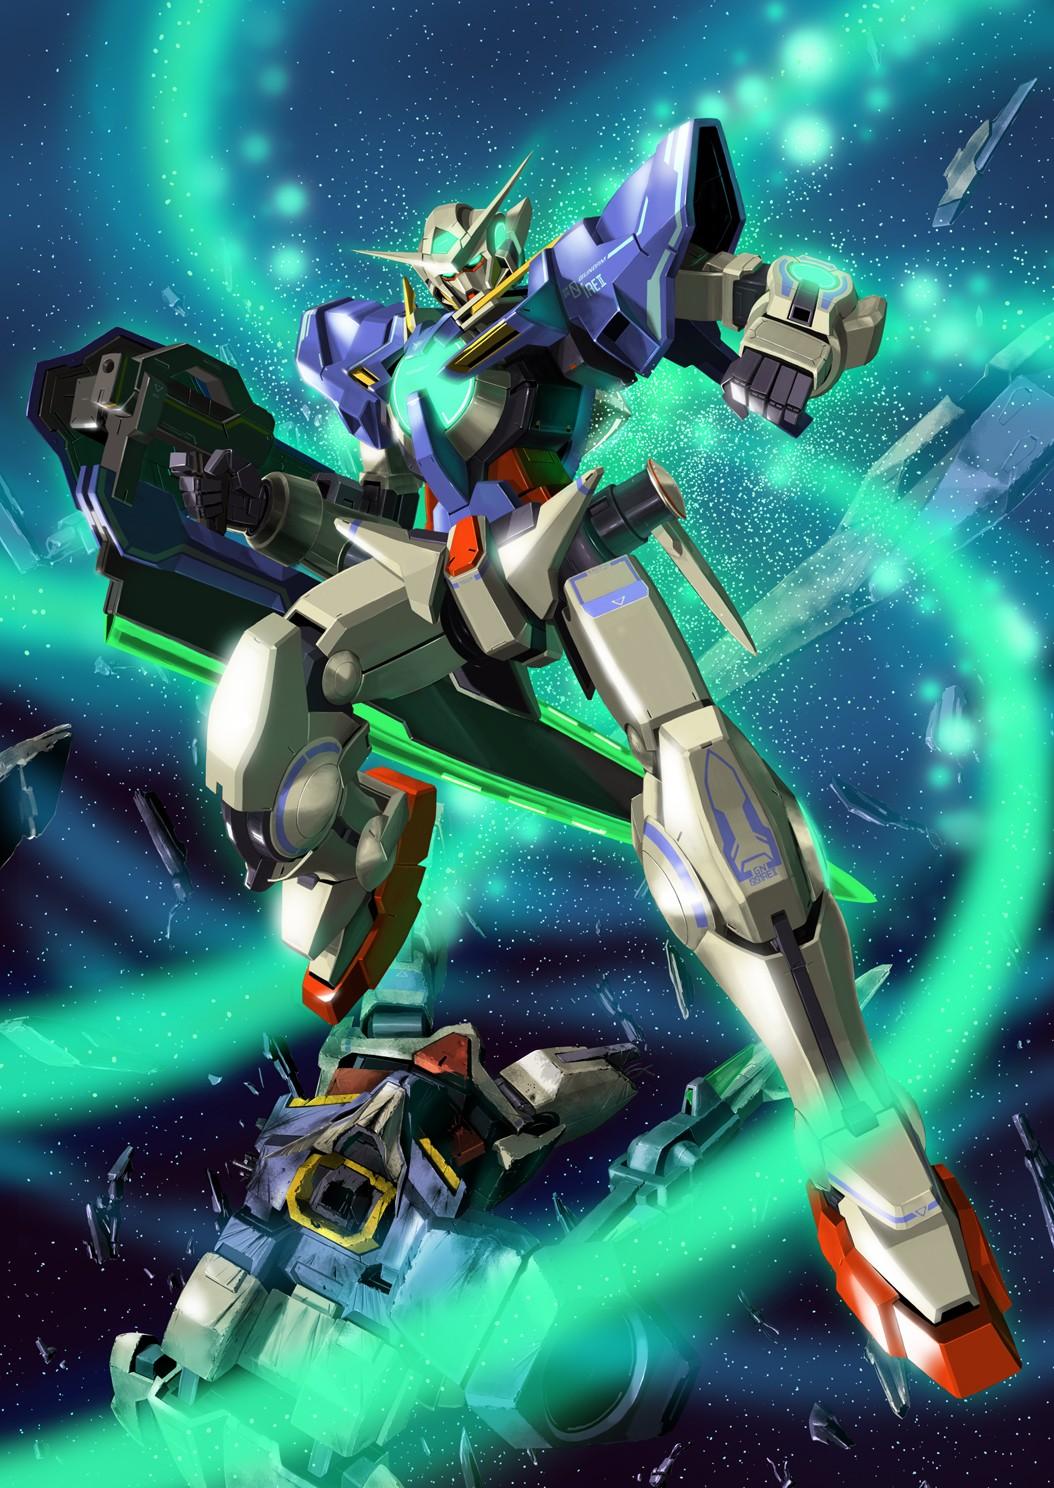 Wallpaper Anime Space Toy Machine Mobile Suit Gundam 00